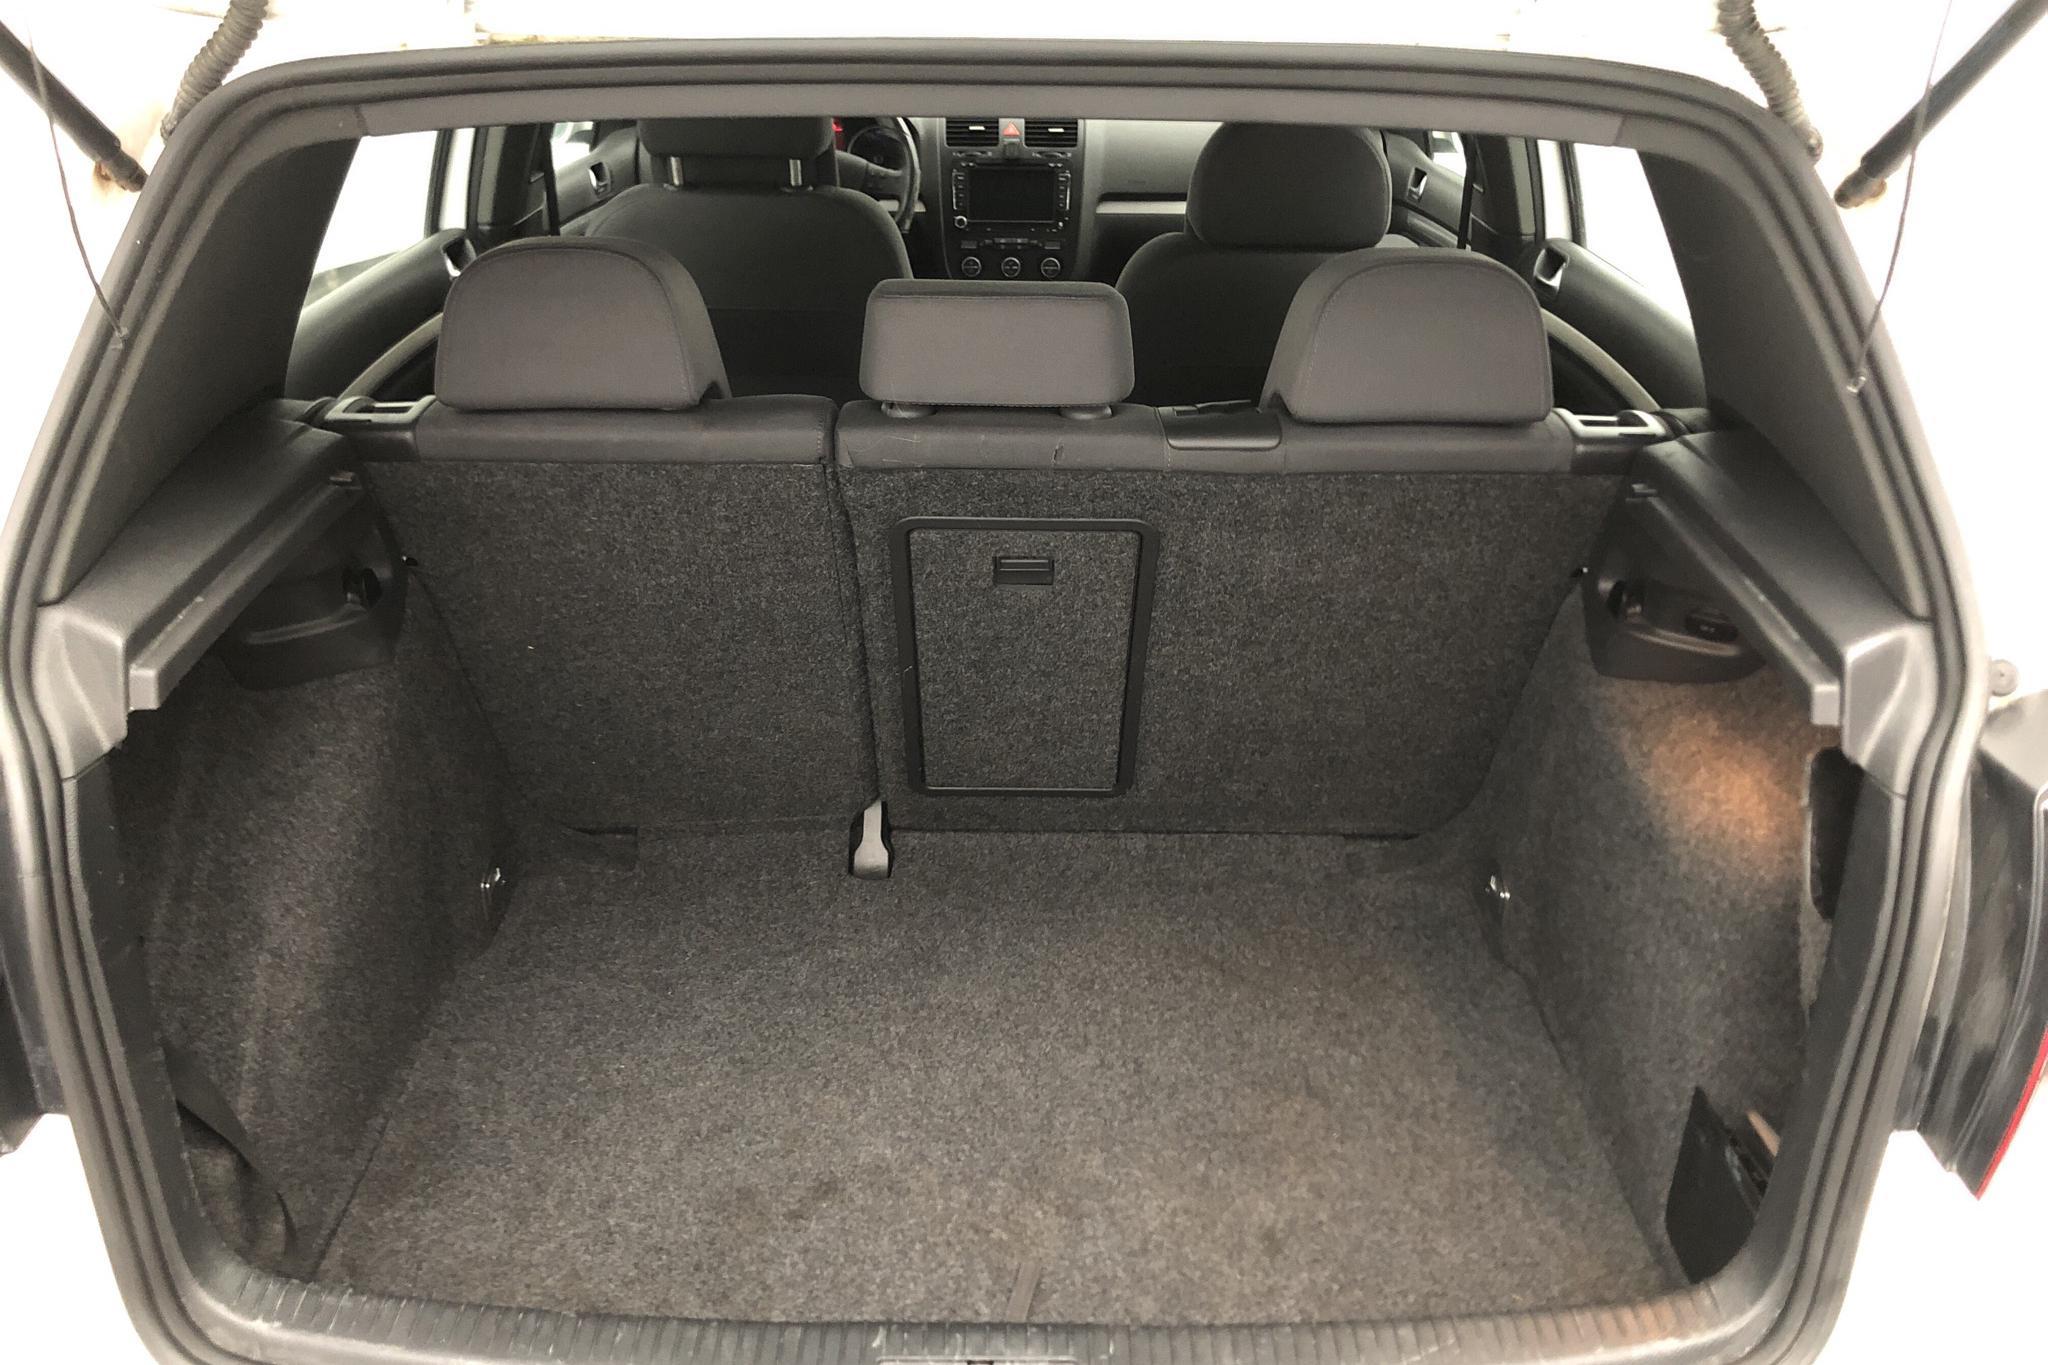 VW Golf A5 2.0 GTI 5dr (200hk) - 22 204 mil - Automat - vit - 2009